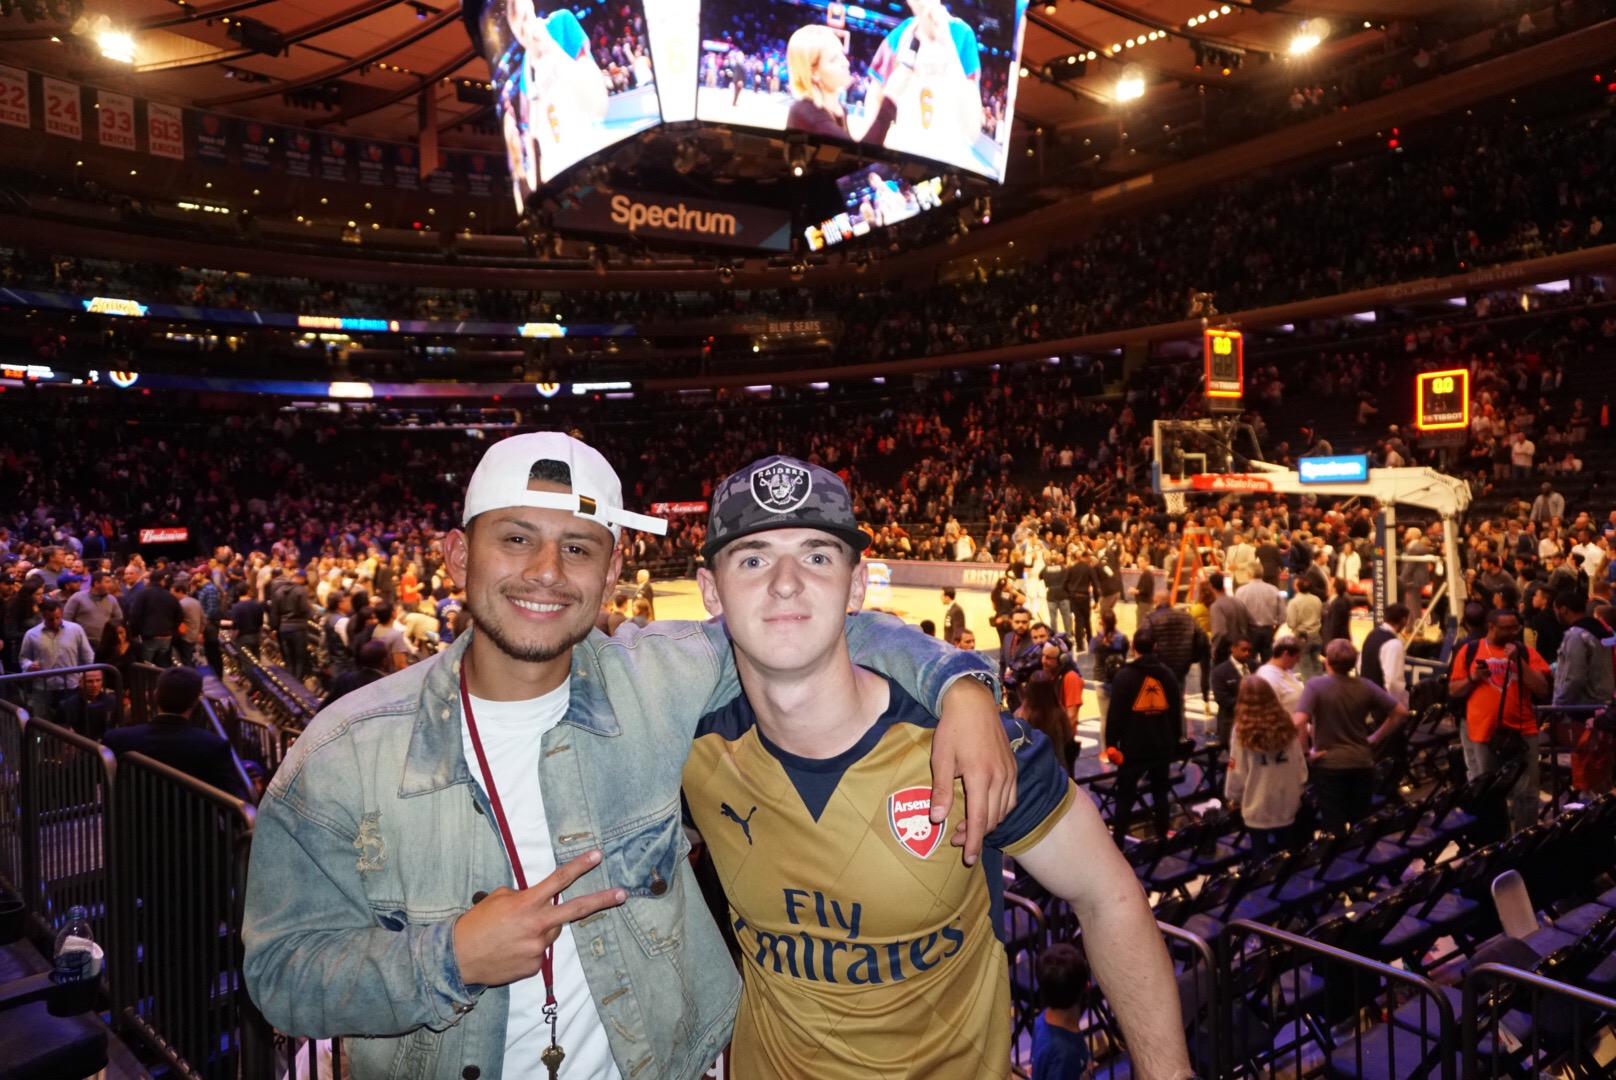 Madison Square Garden - New York, New York Porzingis Scores Career high 40 points